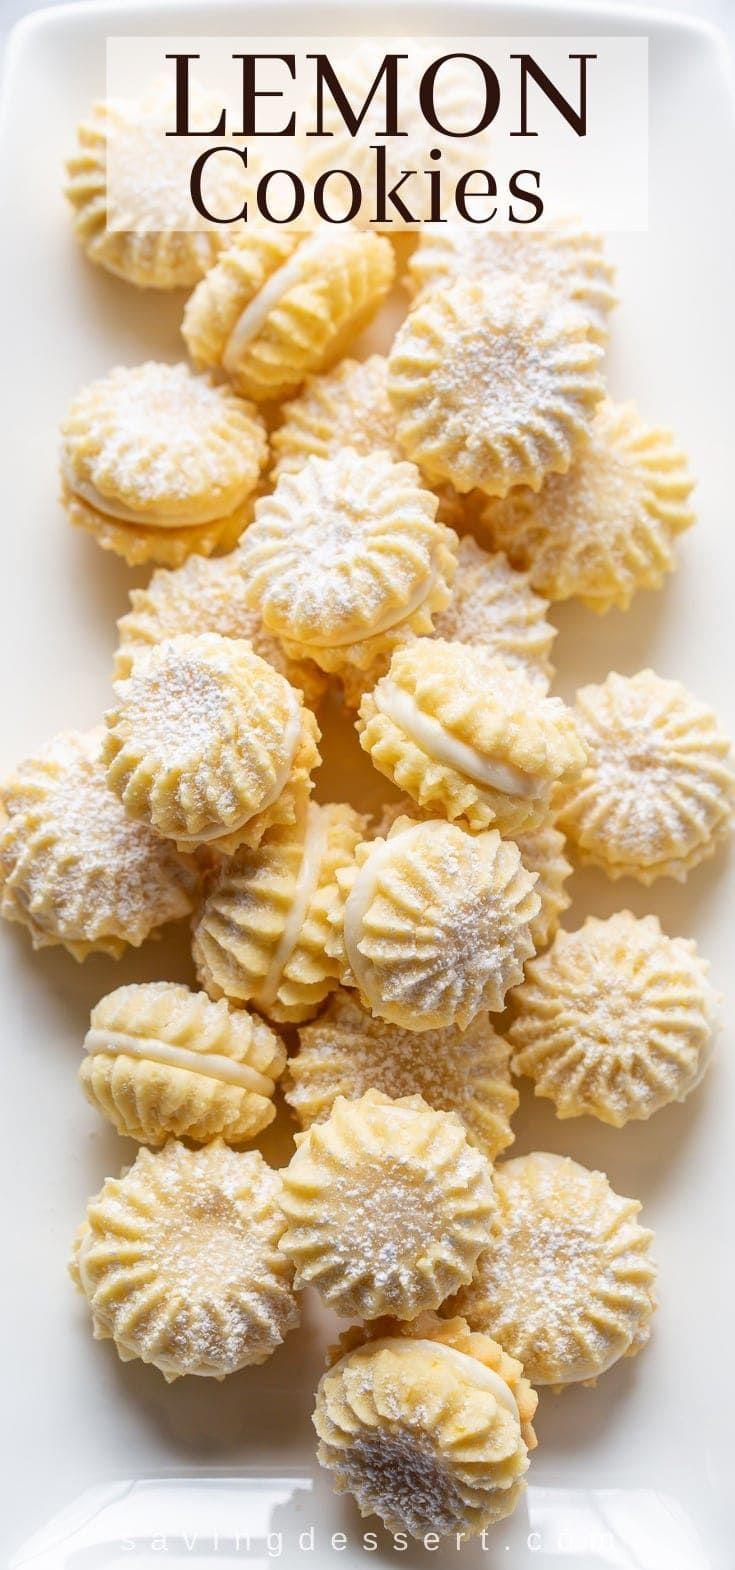 Photo of Lemon Cookies with Lemon Cream Filling